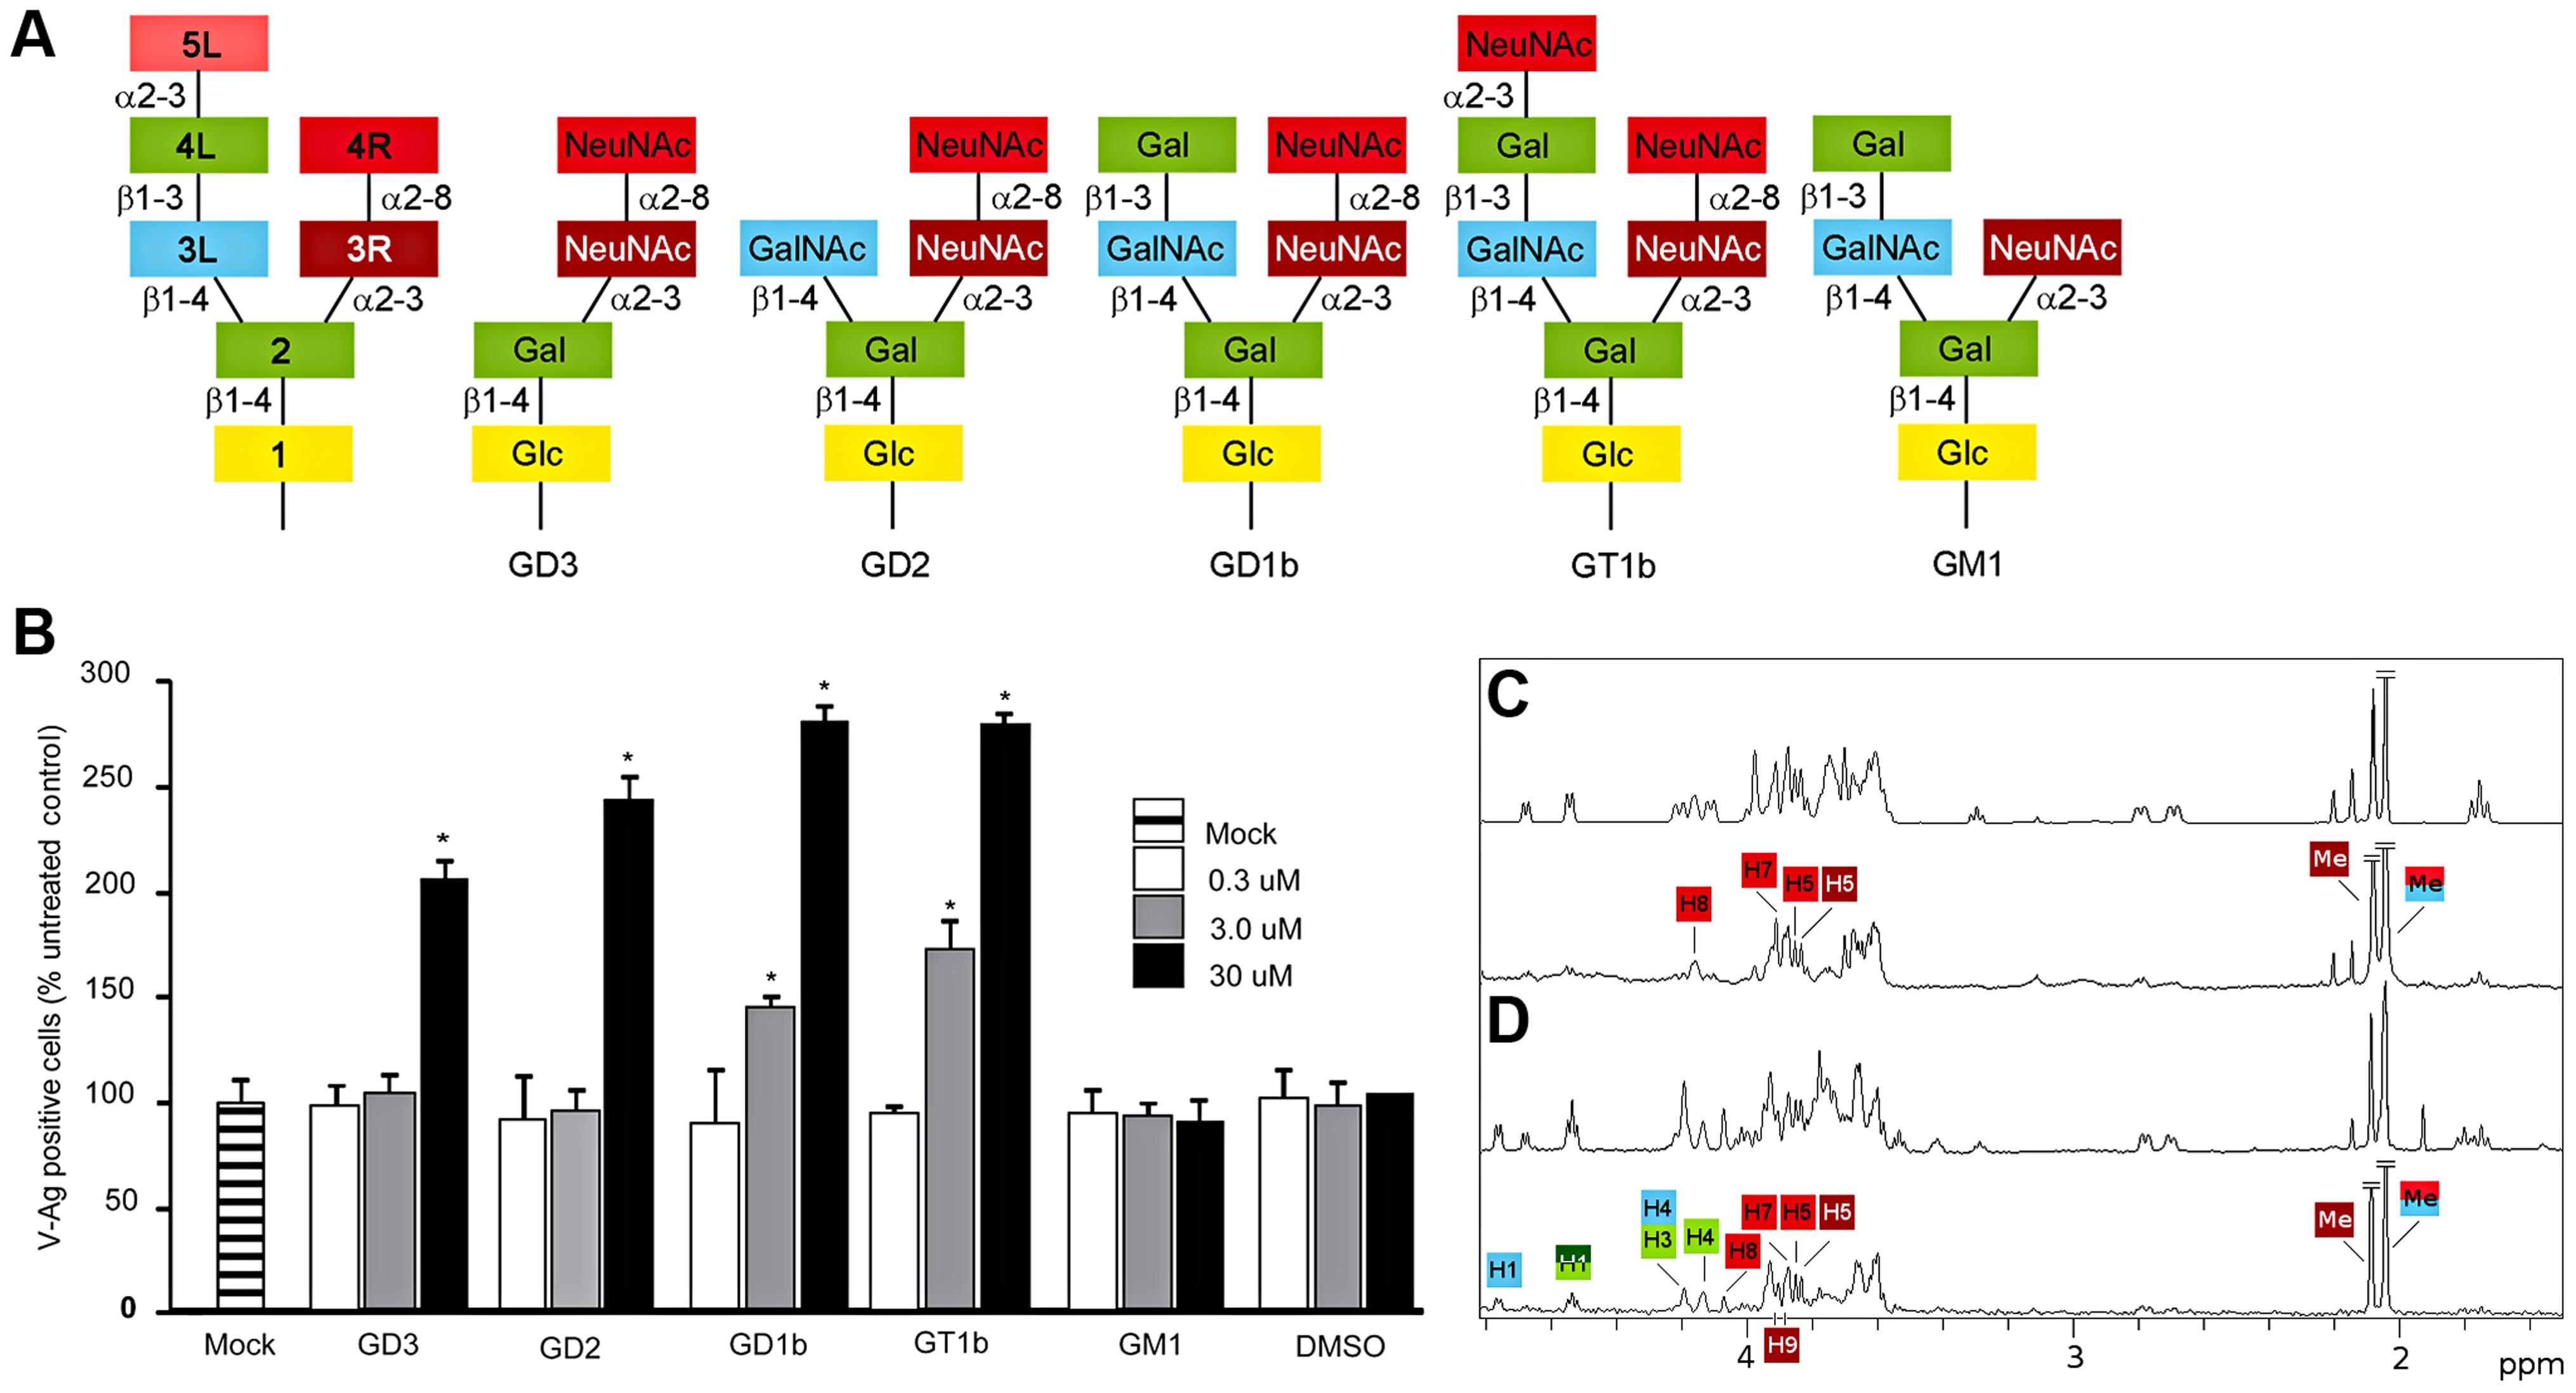 B-series gangliosides are receptors for BKPyV.